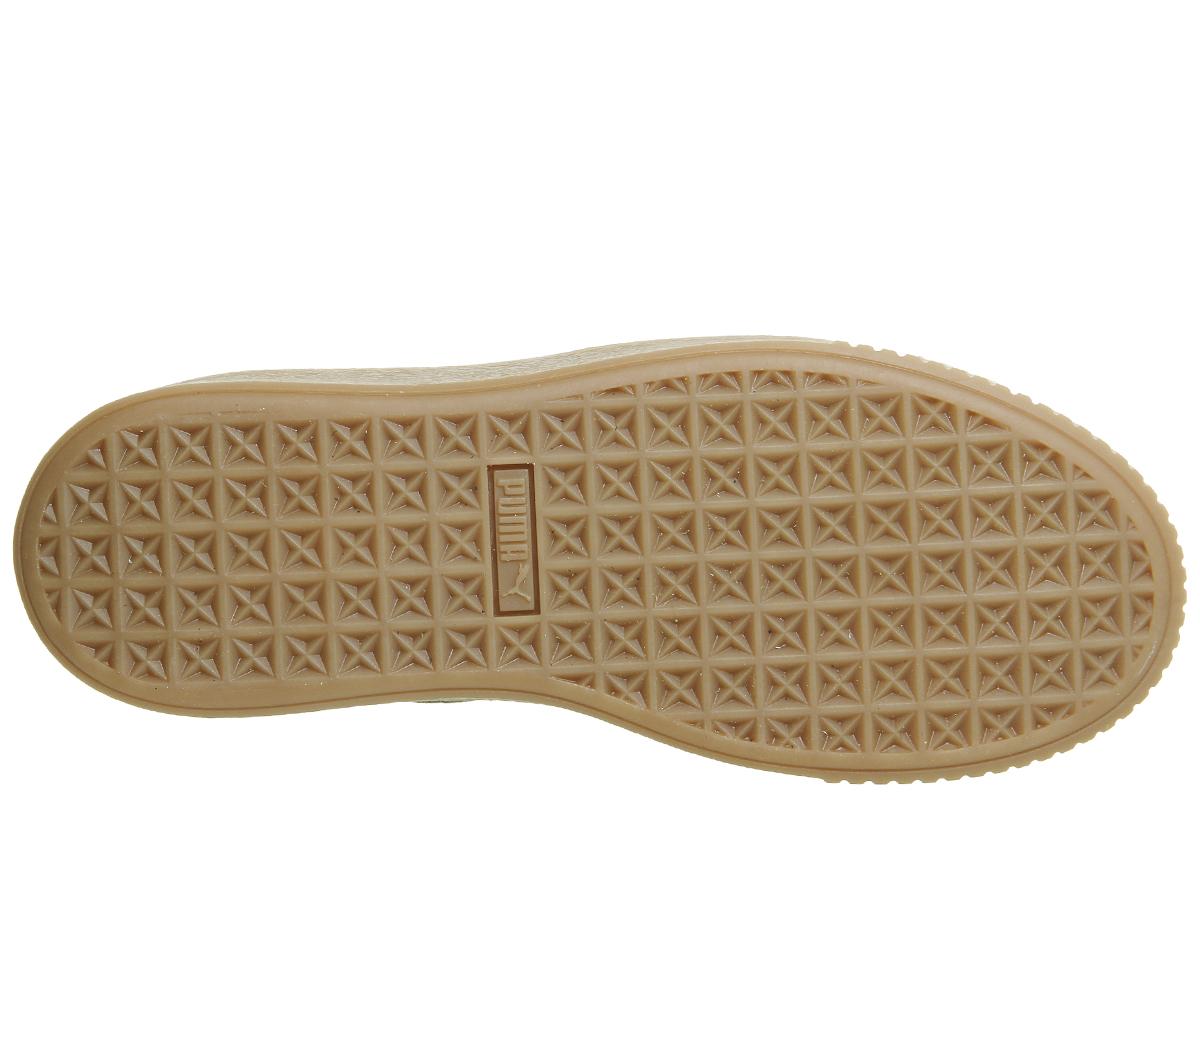 c6aa075c96ba3 SENTINELLE Womens Puma Suede plates-formes d OLIVE argent gomme formateurs  chaussures